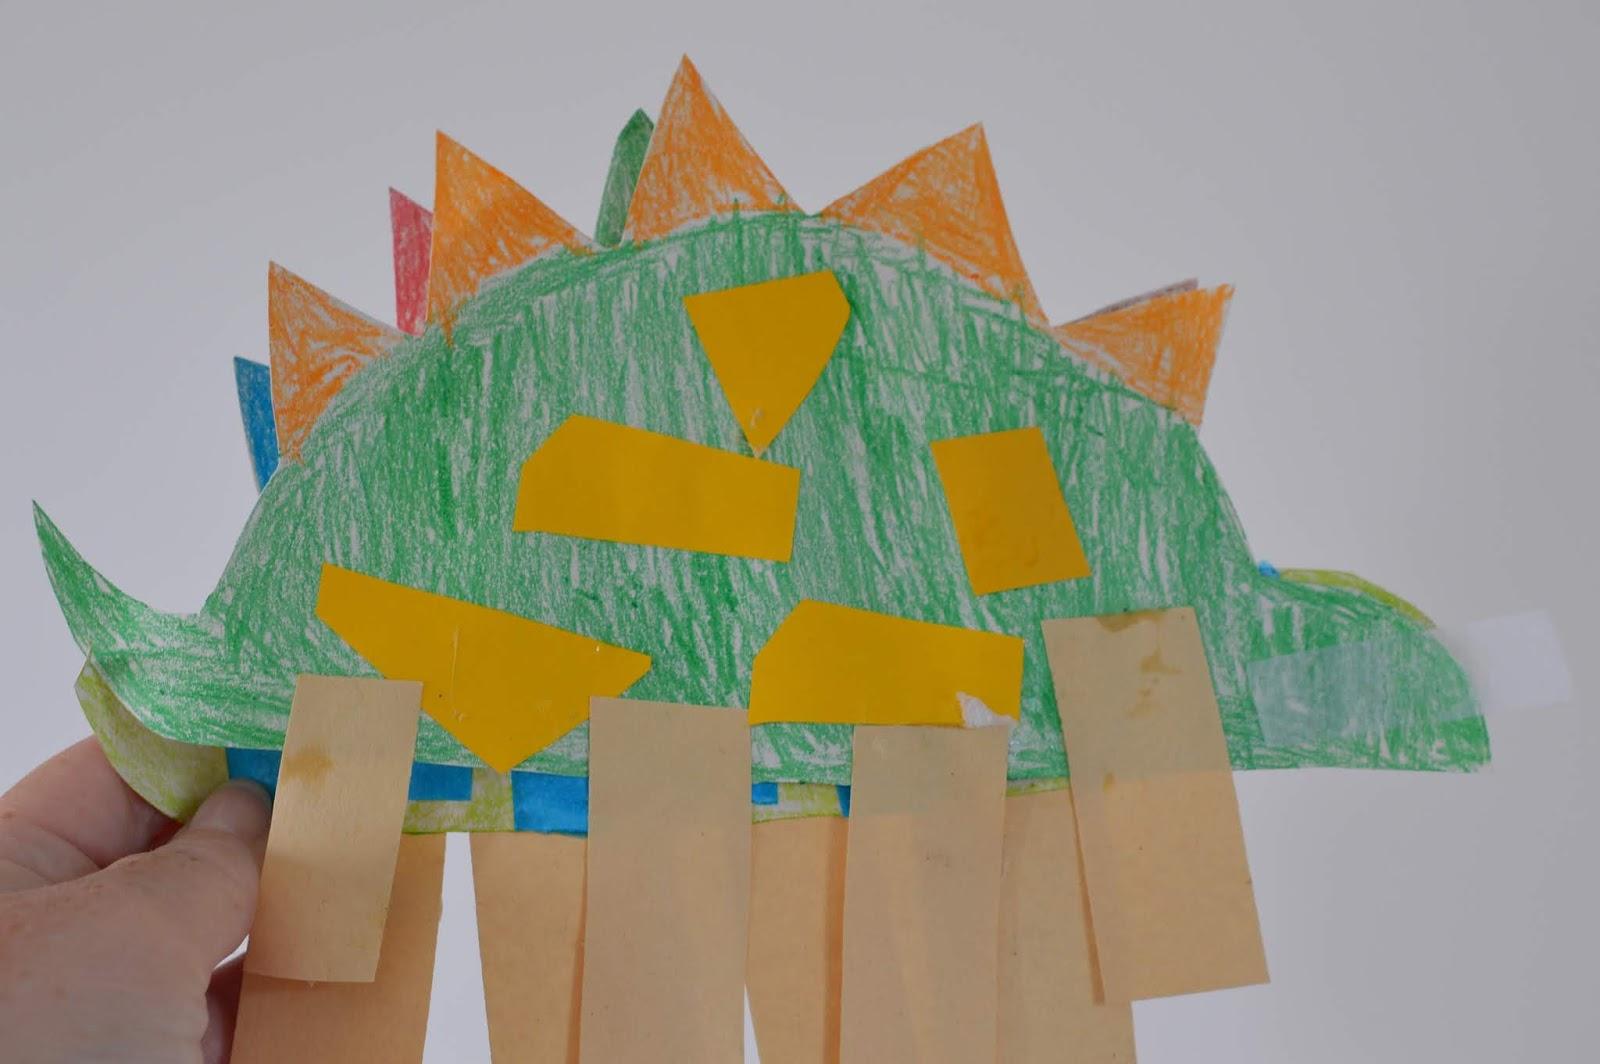 Les Ecureuils Campsite, Vendee - A Eurocamp Site near Puy du Fou (Full Review) - kids club crafts